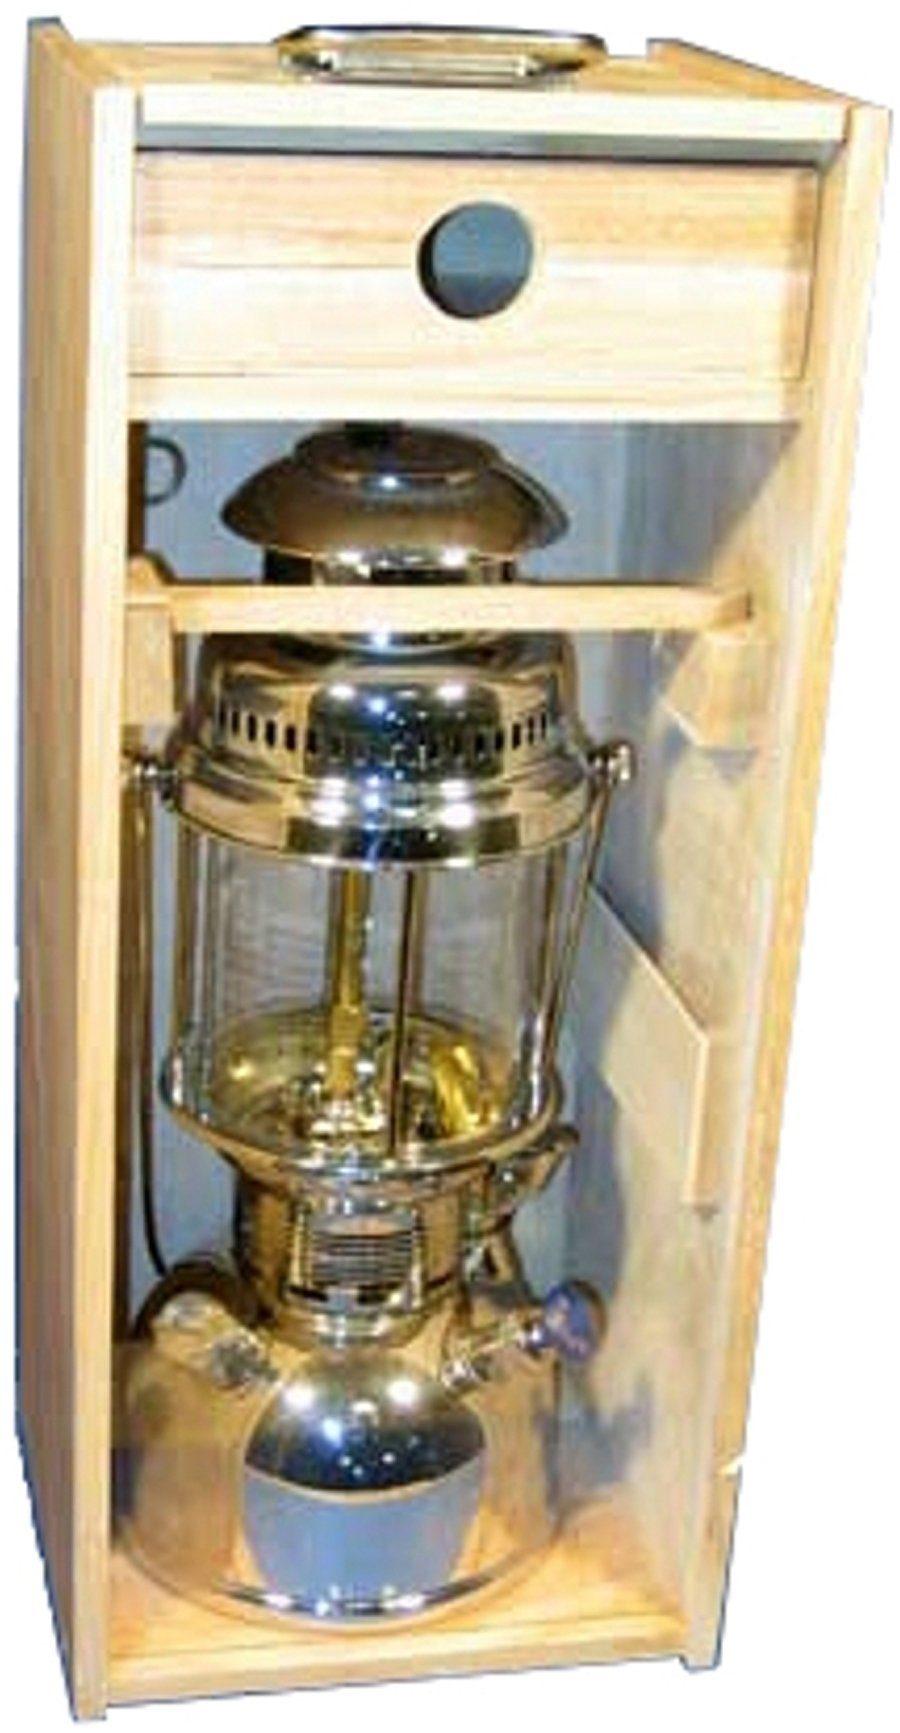 Petromax Camping-Beleuchtung »Holzbox mit Plexiglasscheibe«